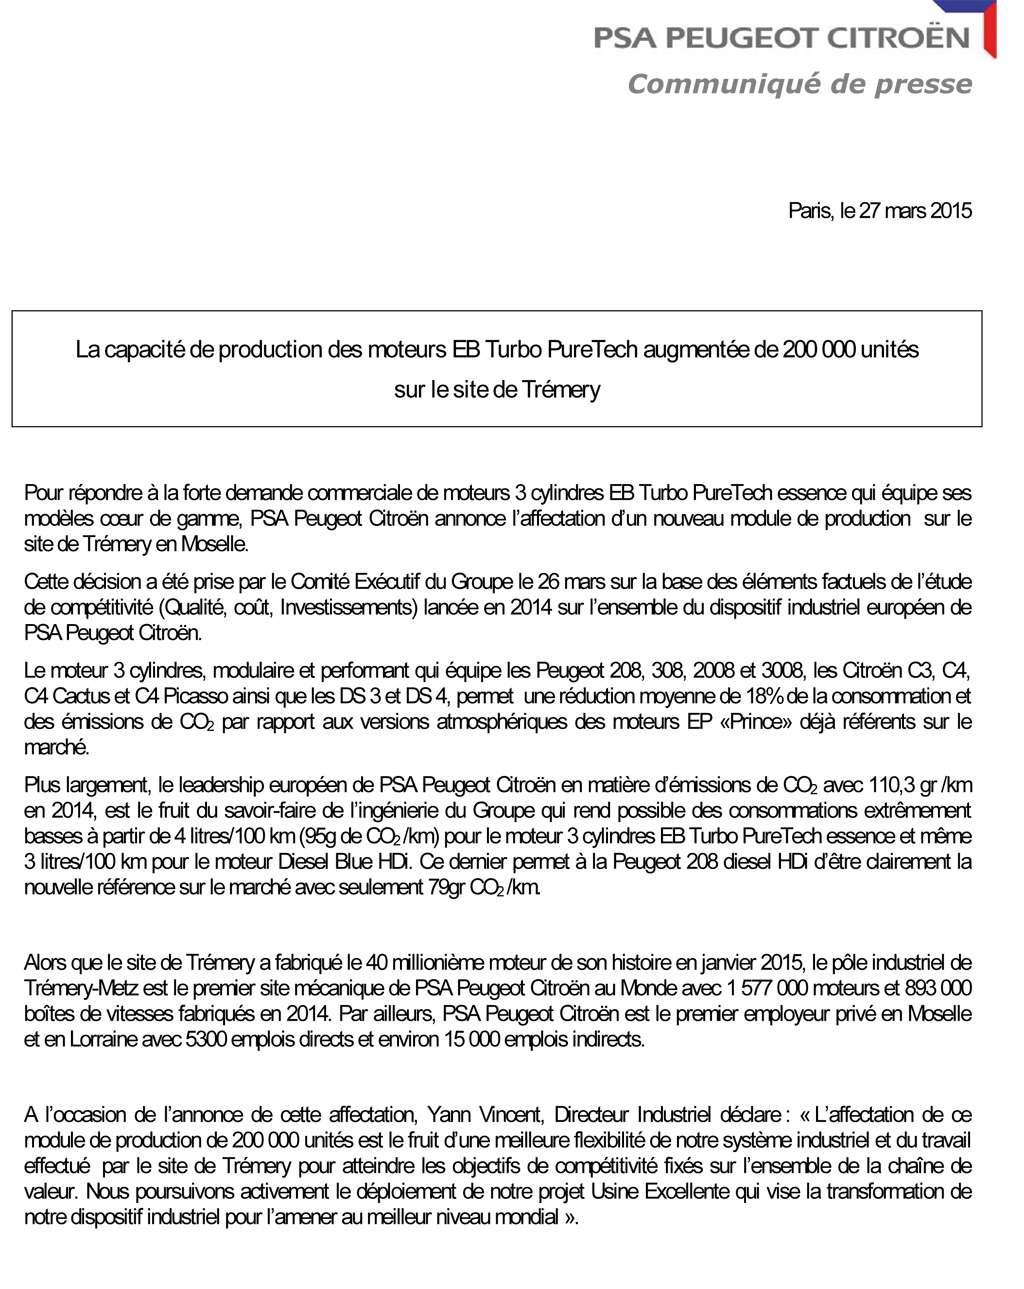 [INFORMATION] Les usines PSA en Europe - Page 15 Tremer10